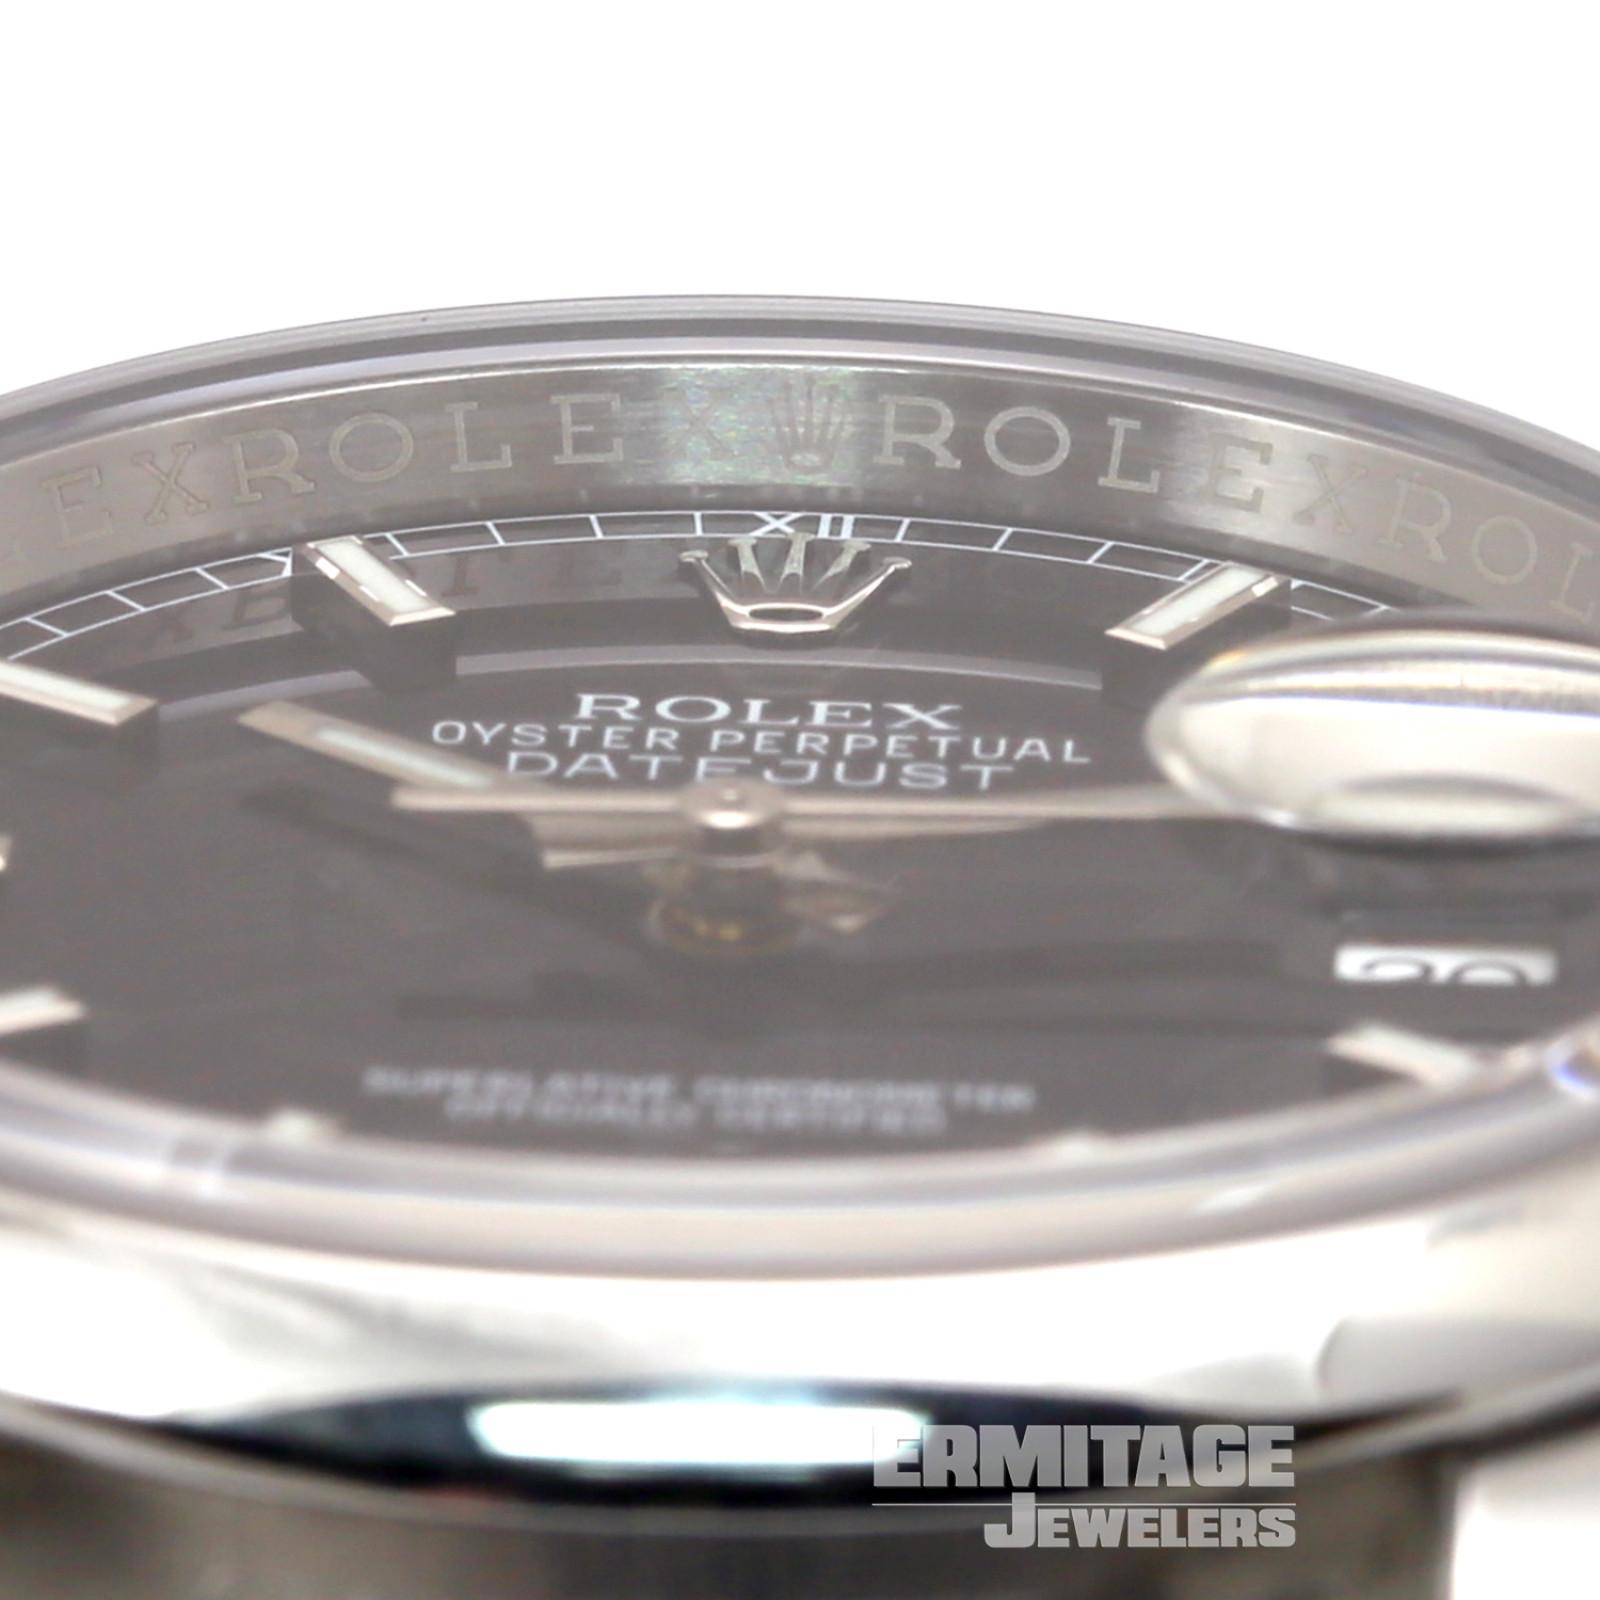 Stainless Steel Rolex Datejust 116200 36 mm